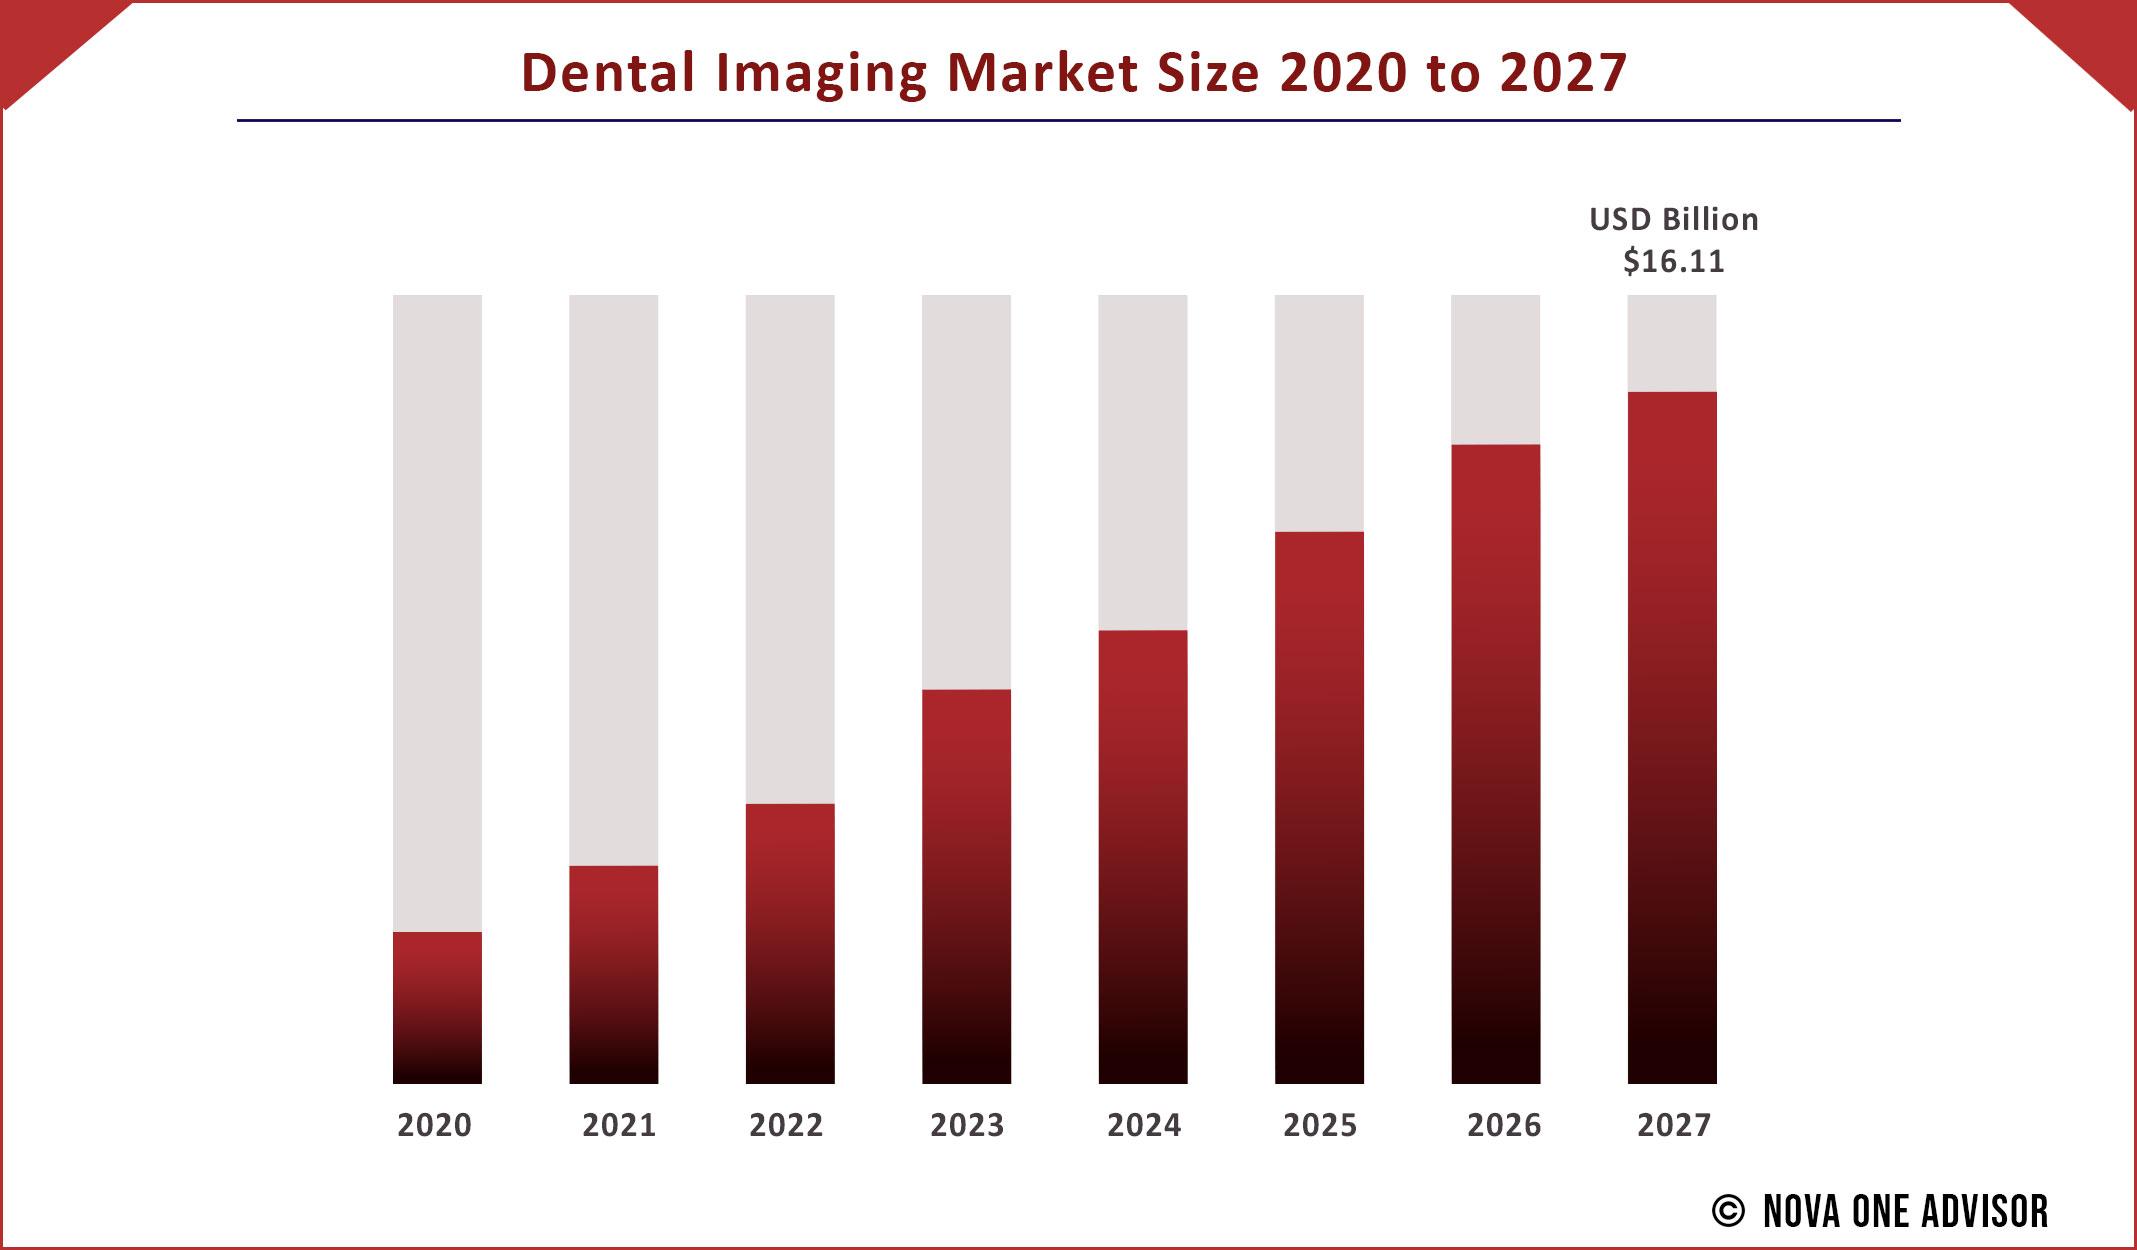 Dental Imaging Market Size 2020 to 2027